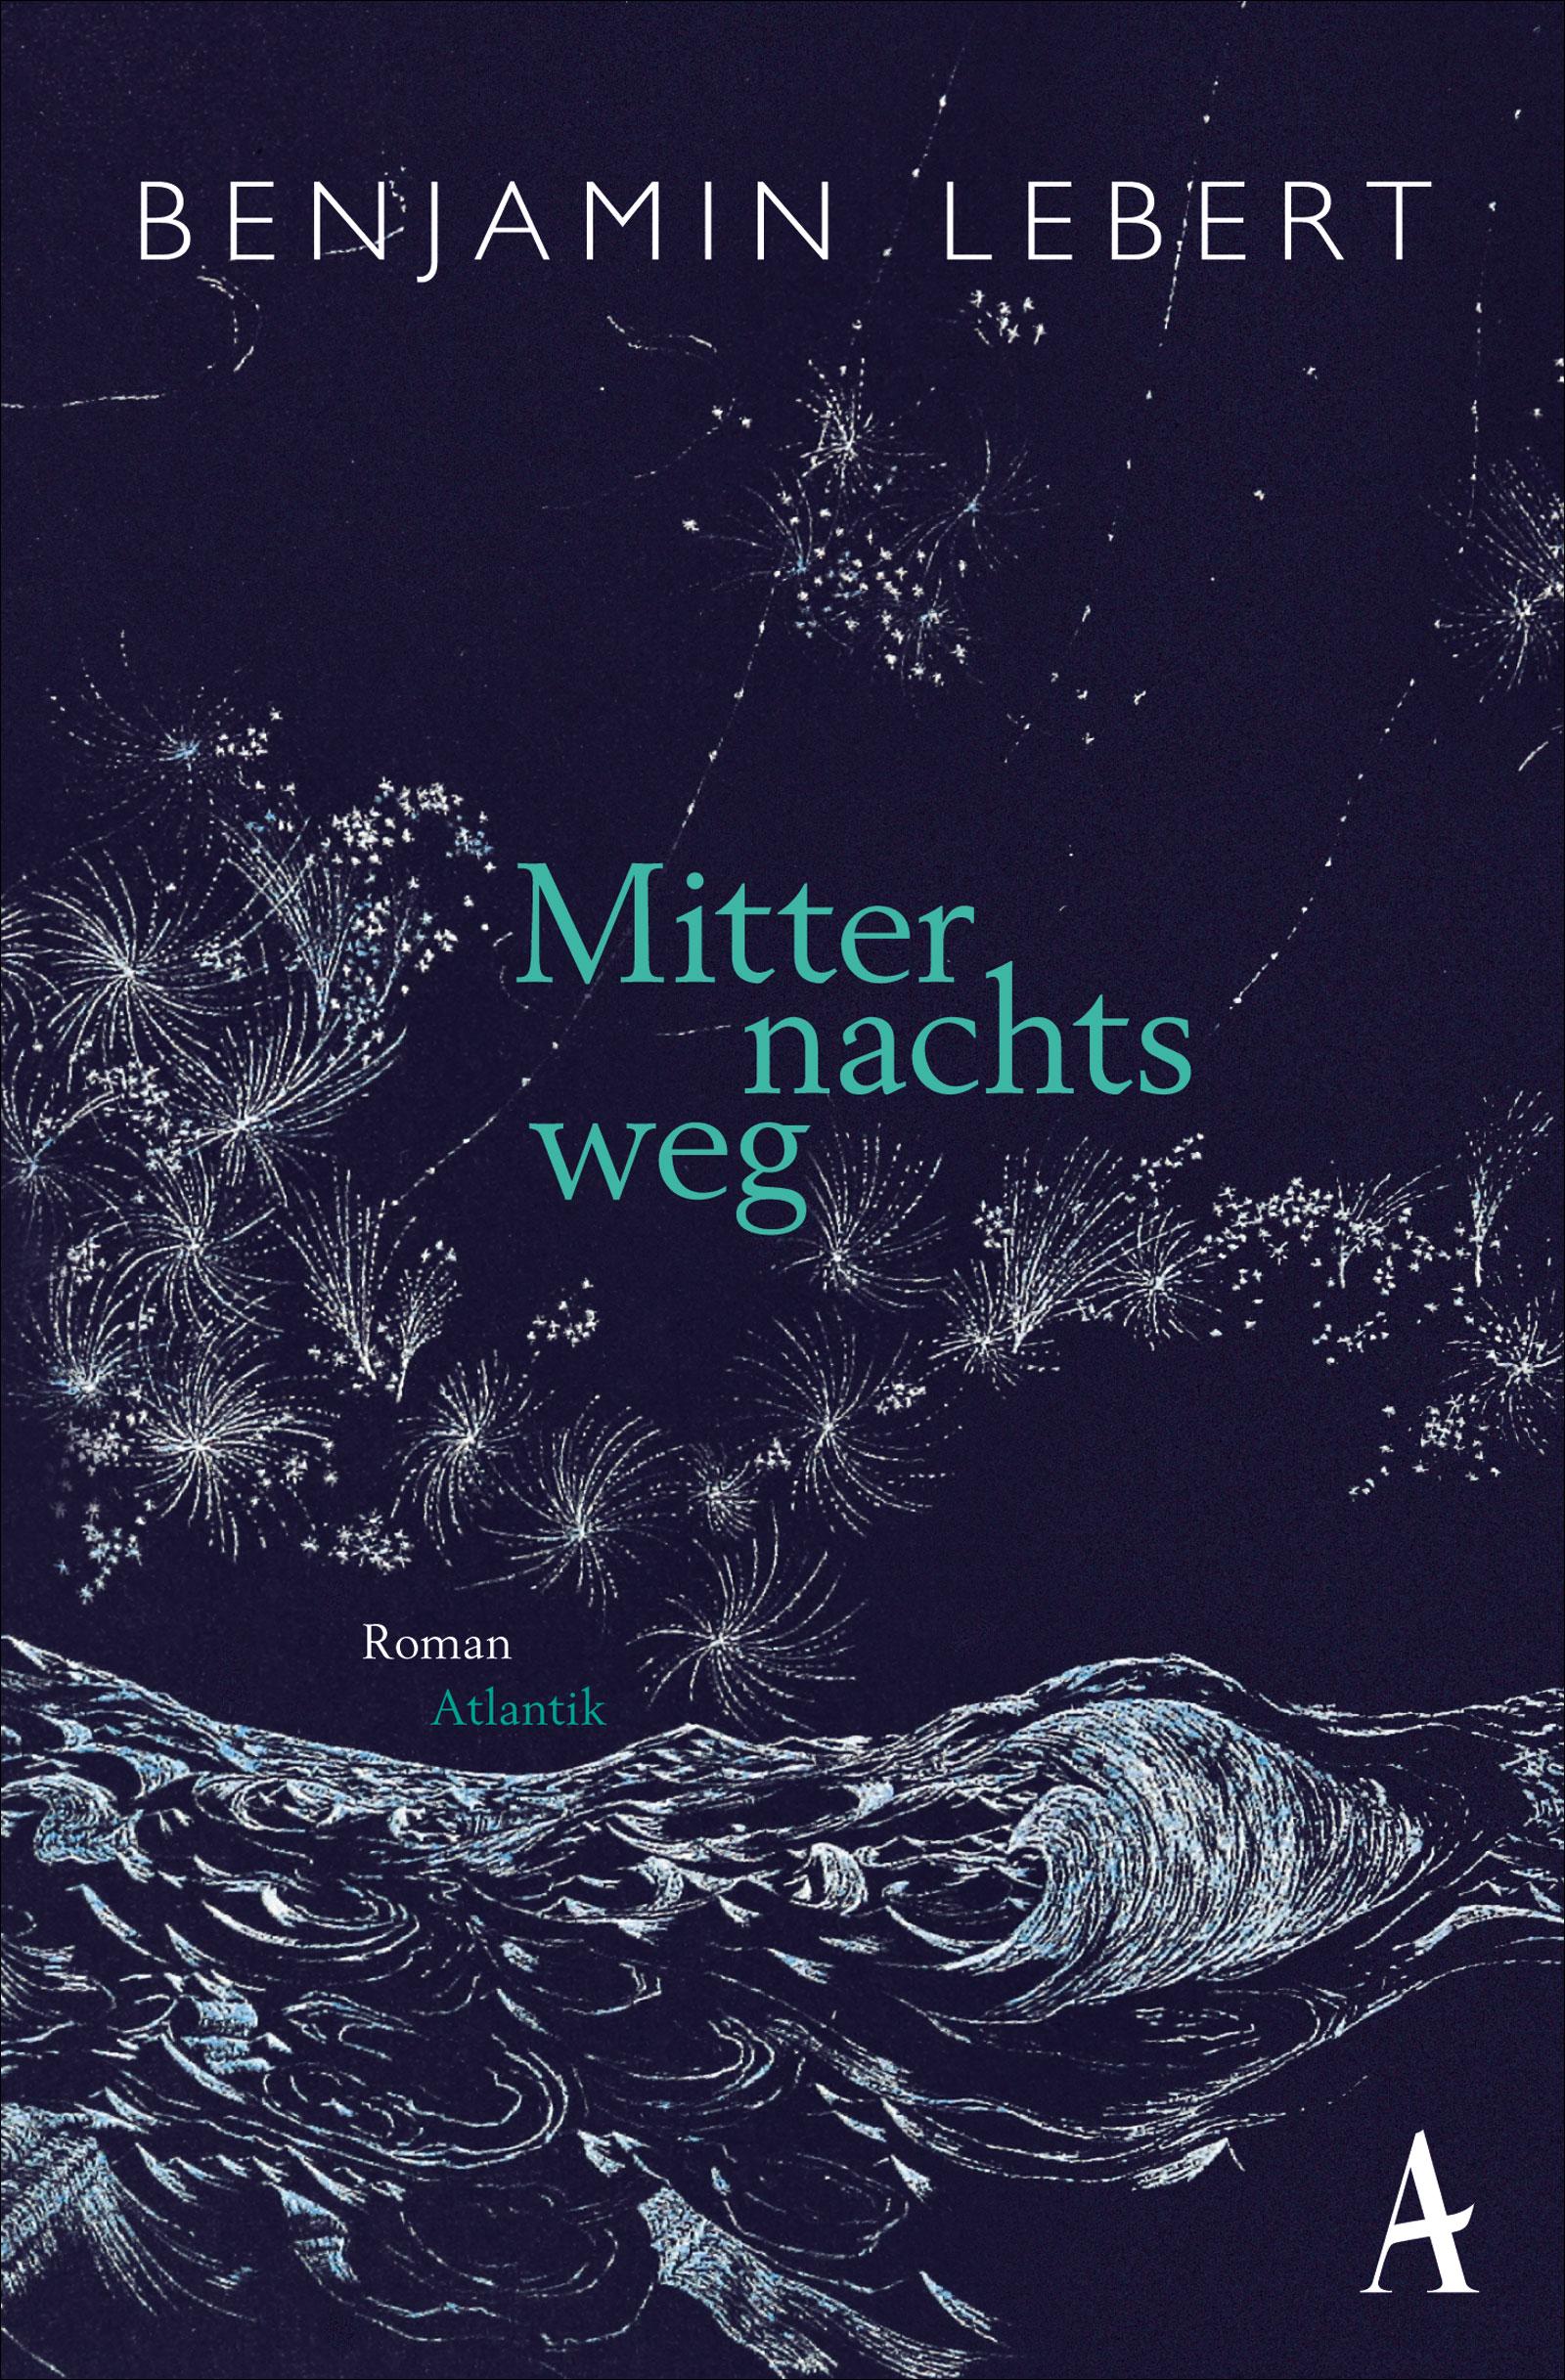 Mitternachtsweg-Benjamin-Lebert